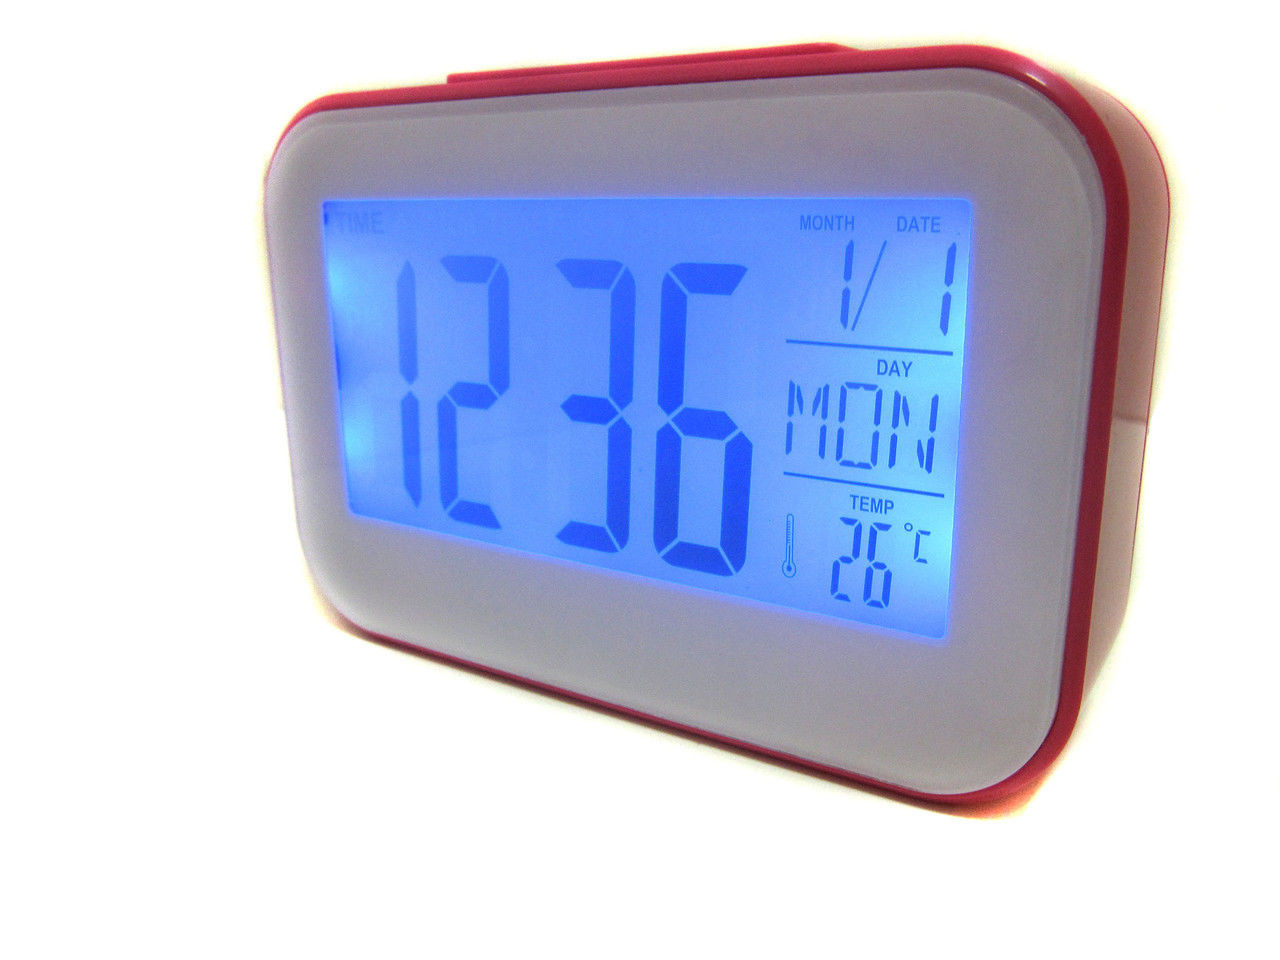 02c649b8 Часы будильник термометр календарь 2620, цена 171 грн., купить в ...